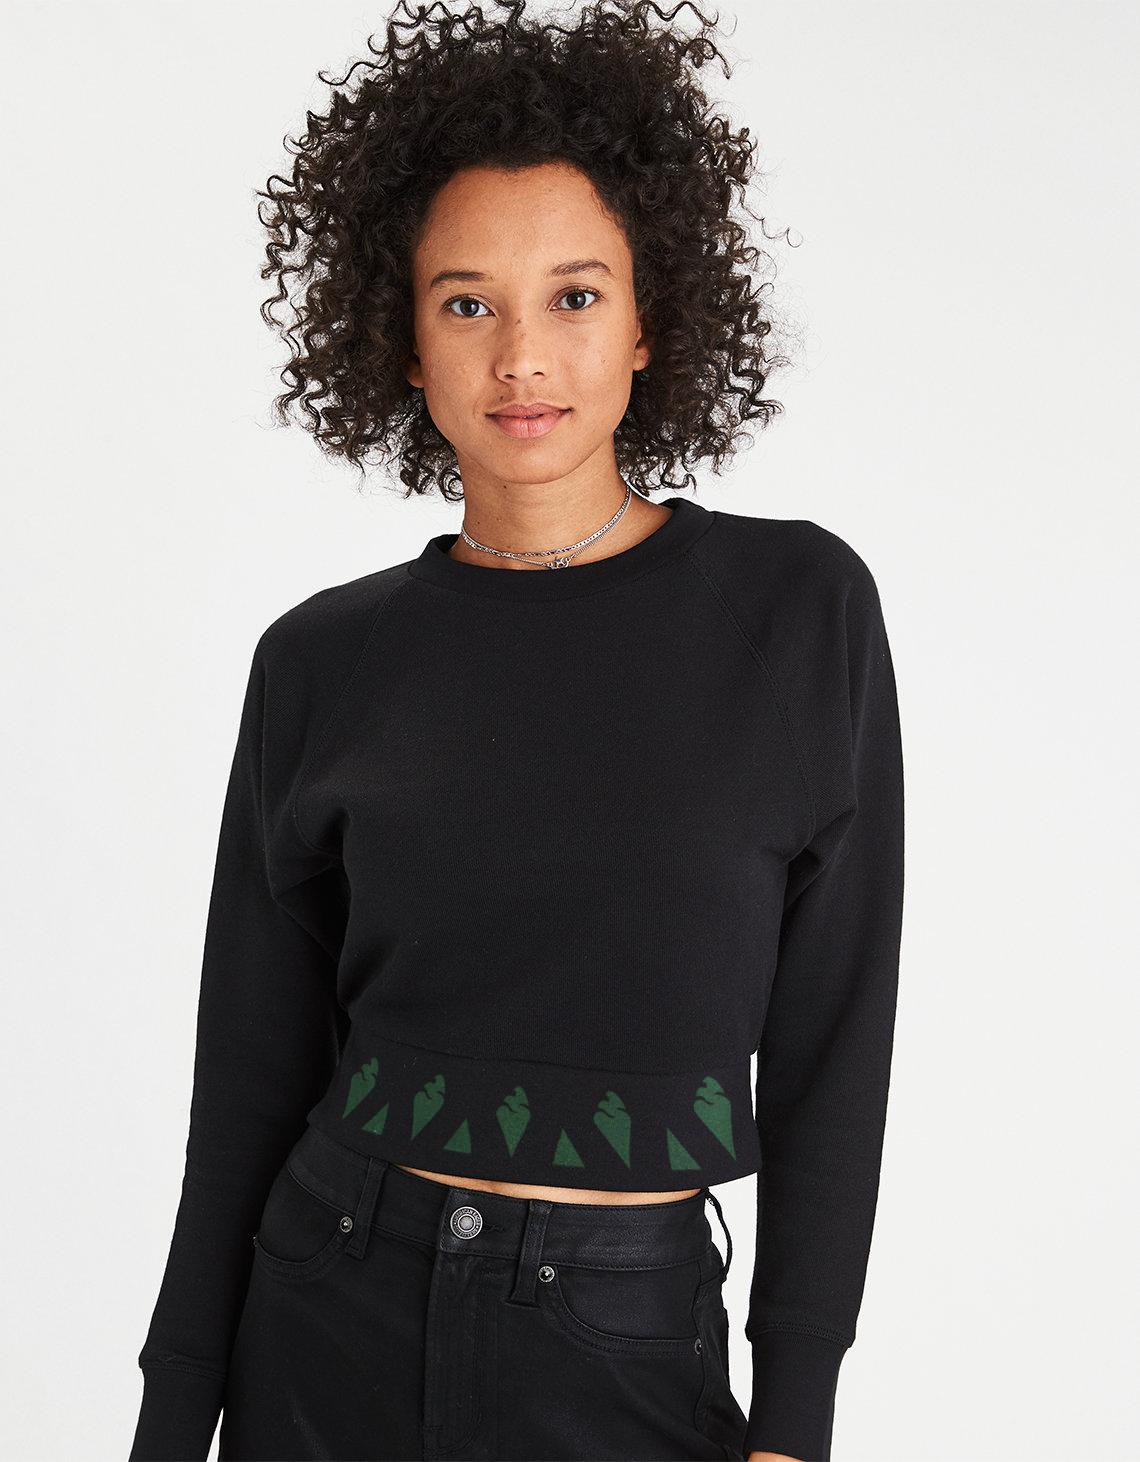 FINALsweater.jpg